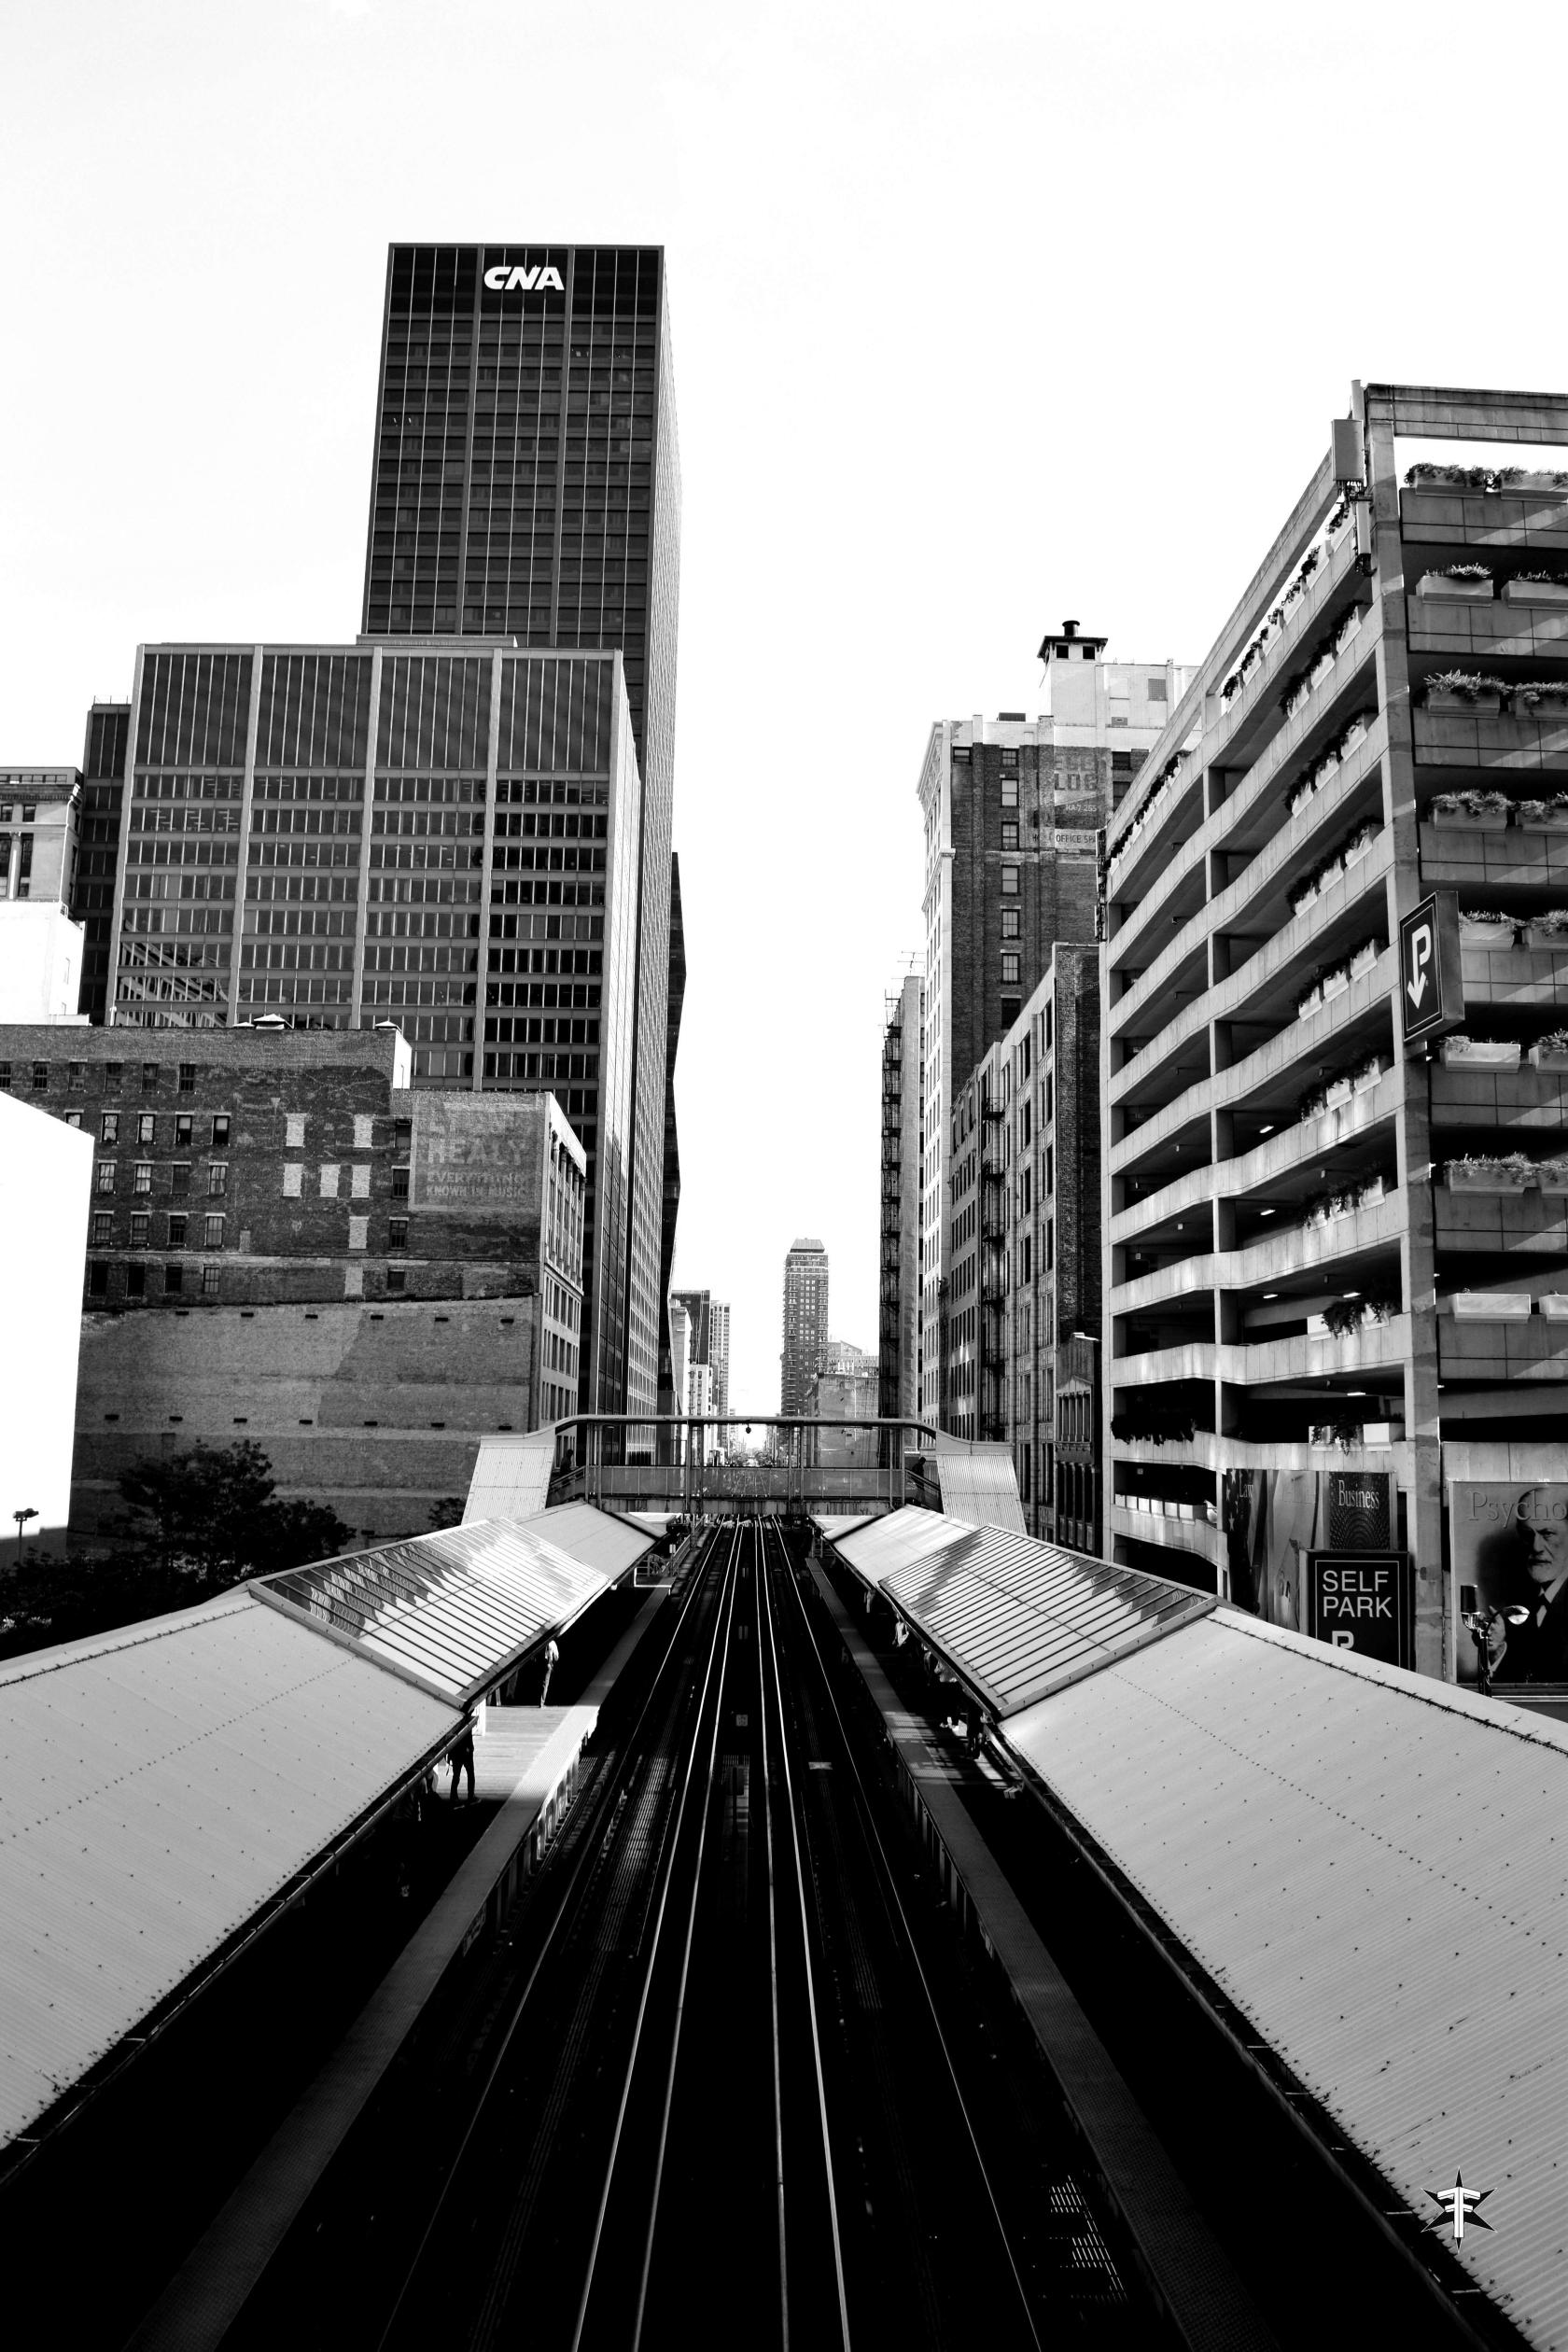 batch_cta chicago wabash loop train contrast buildings black and white.jpg